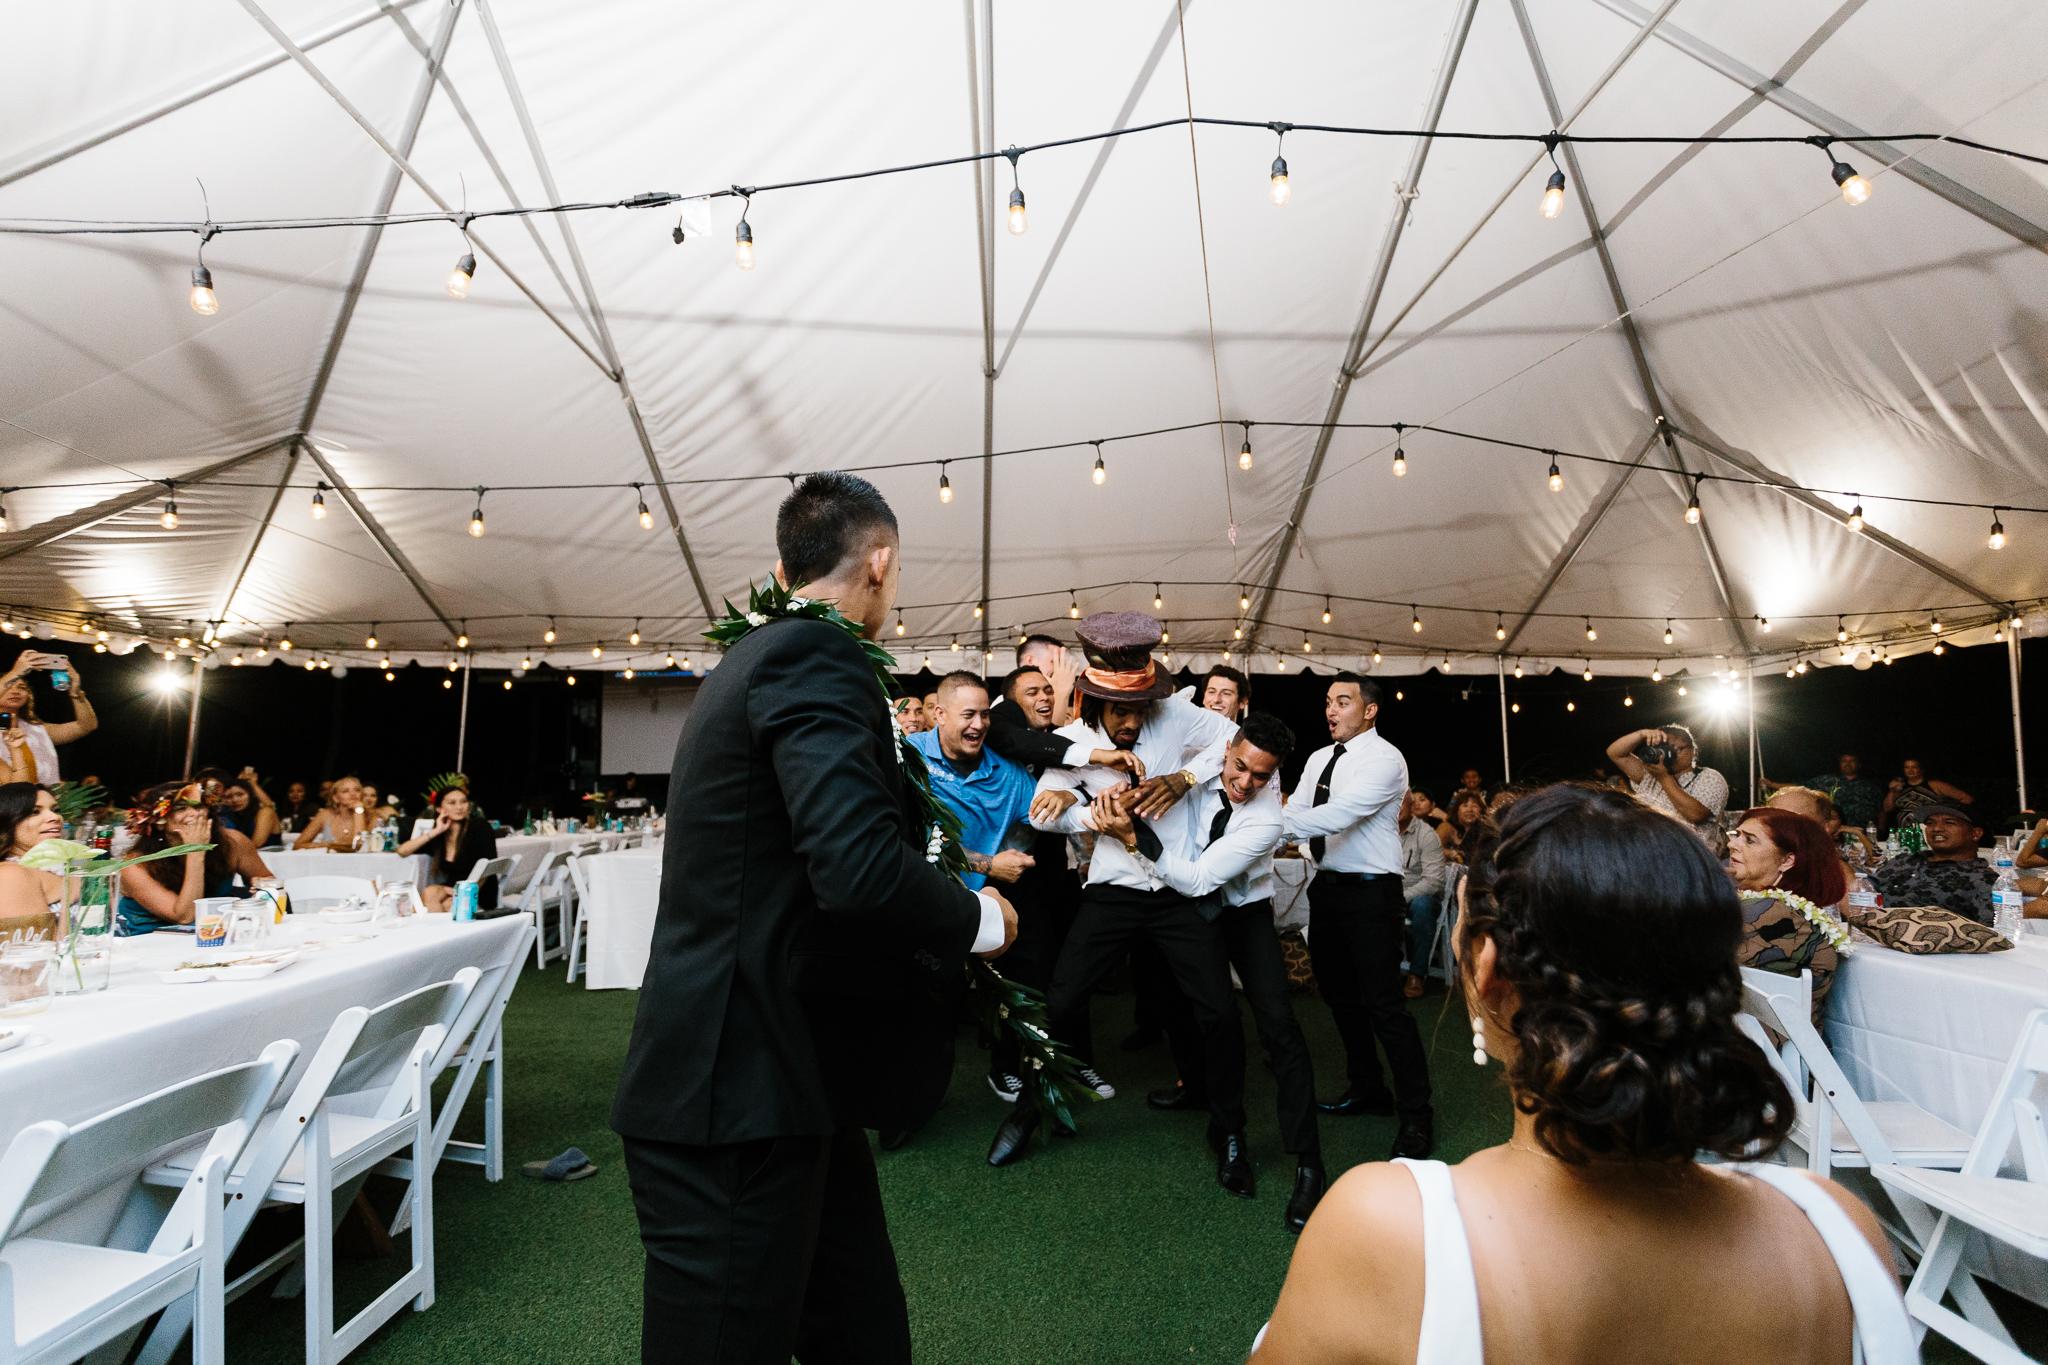 Kualoa_Ranch_Wedding_Photographer_Tone_Hawaii-58.jpg